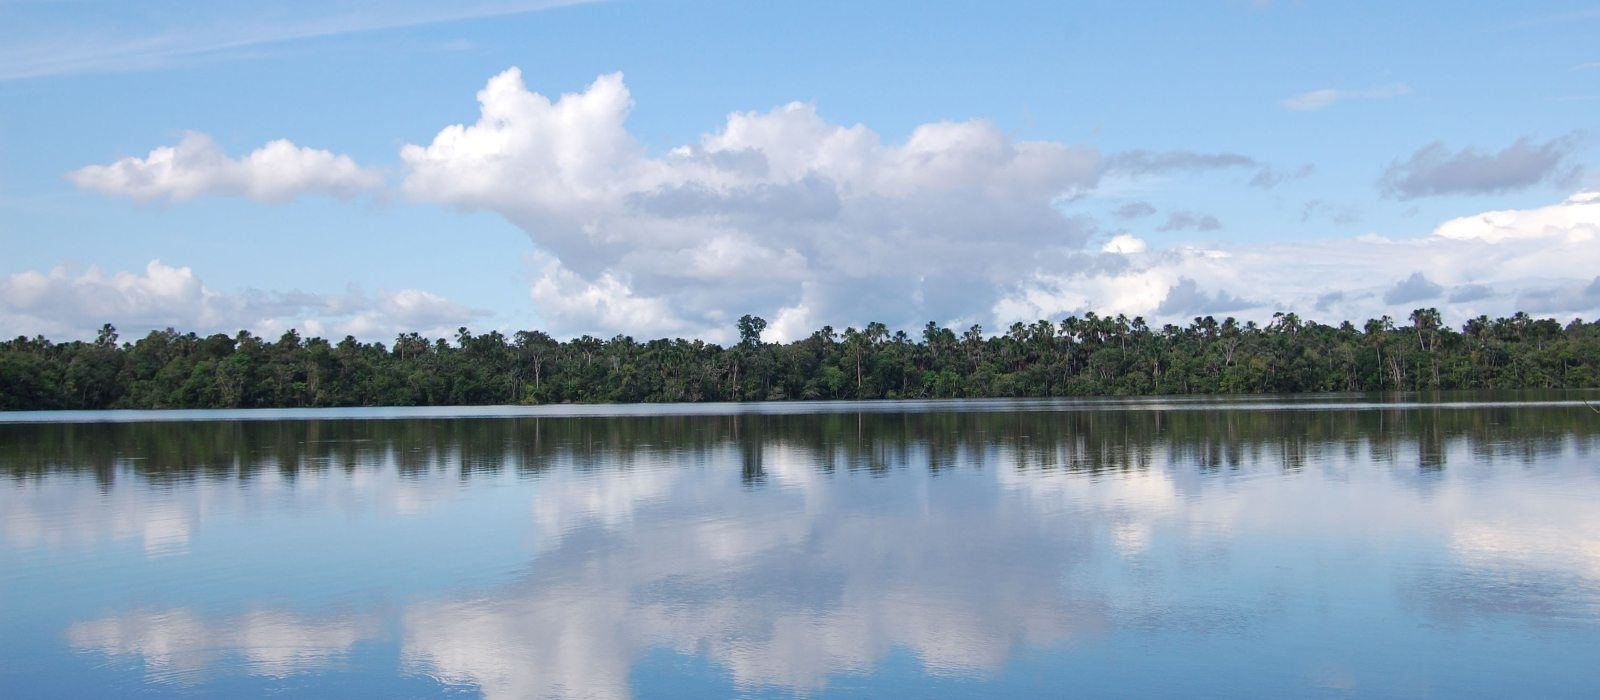 Destination Iquitos Cruise Peru